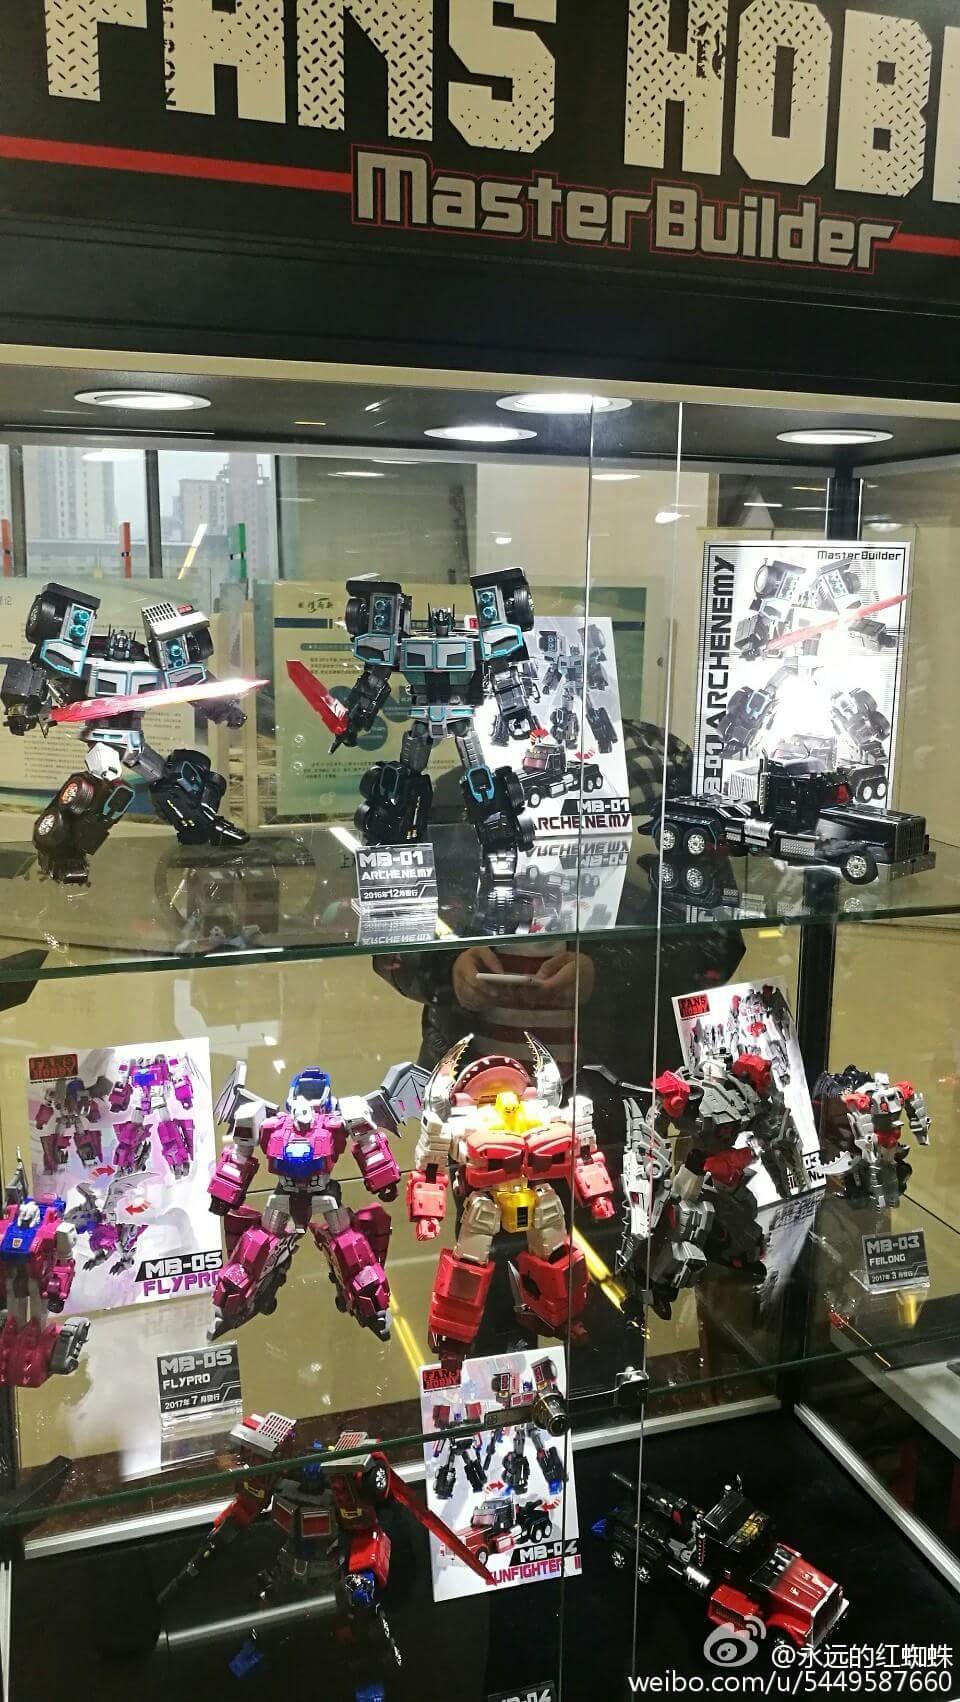 [FansHobby] Produit Tiers - Master Builder MB-02/03/05 - aka Monsterbots/Monstrebots Q1X9JJay